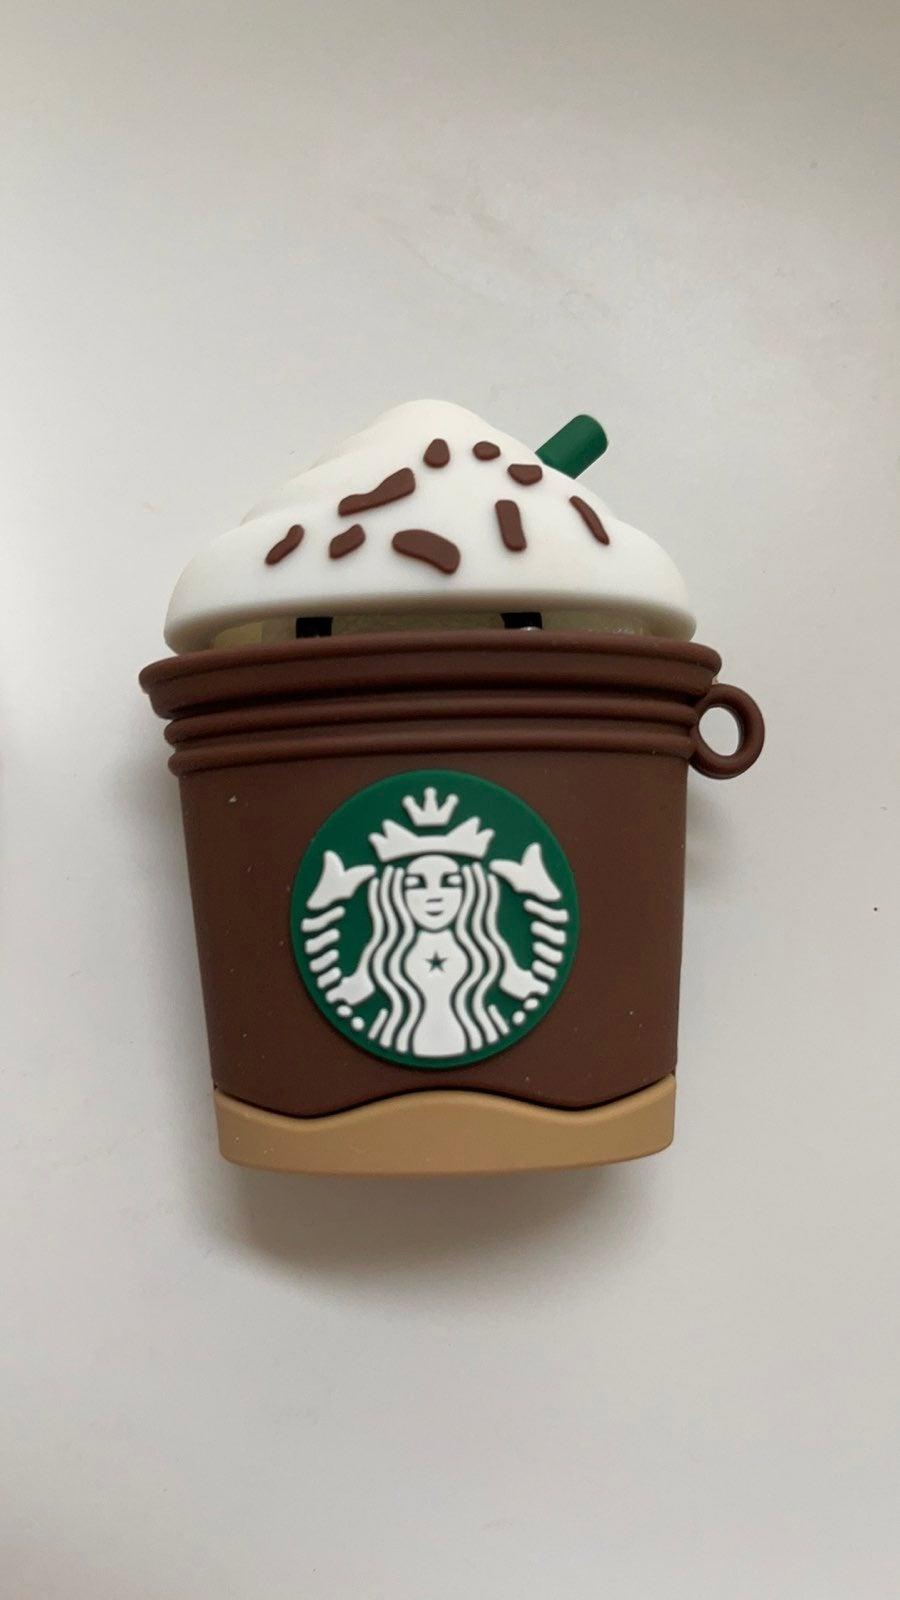 Starbucks airpods case